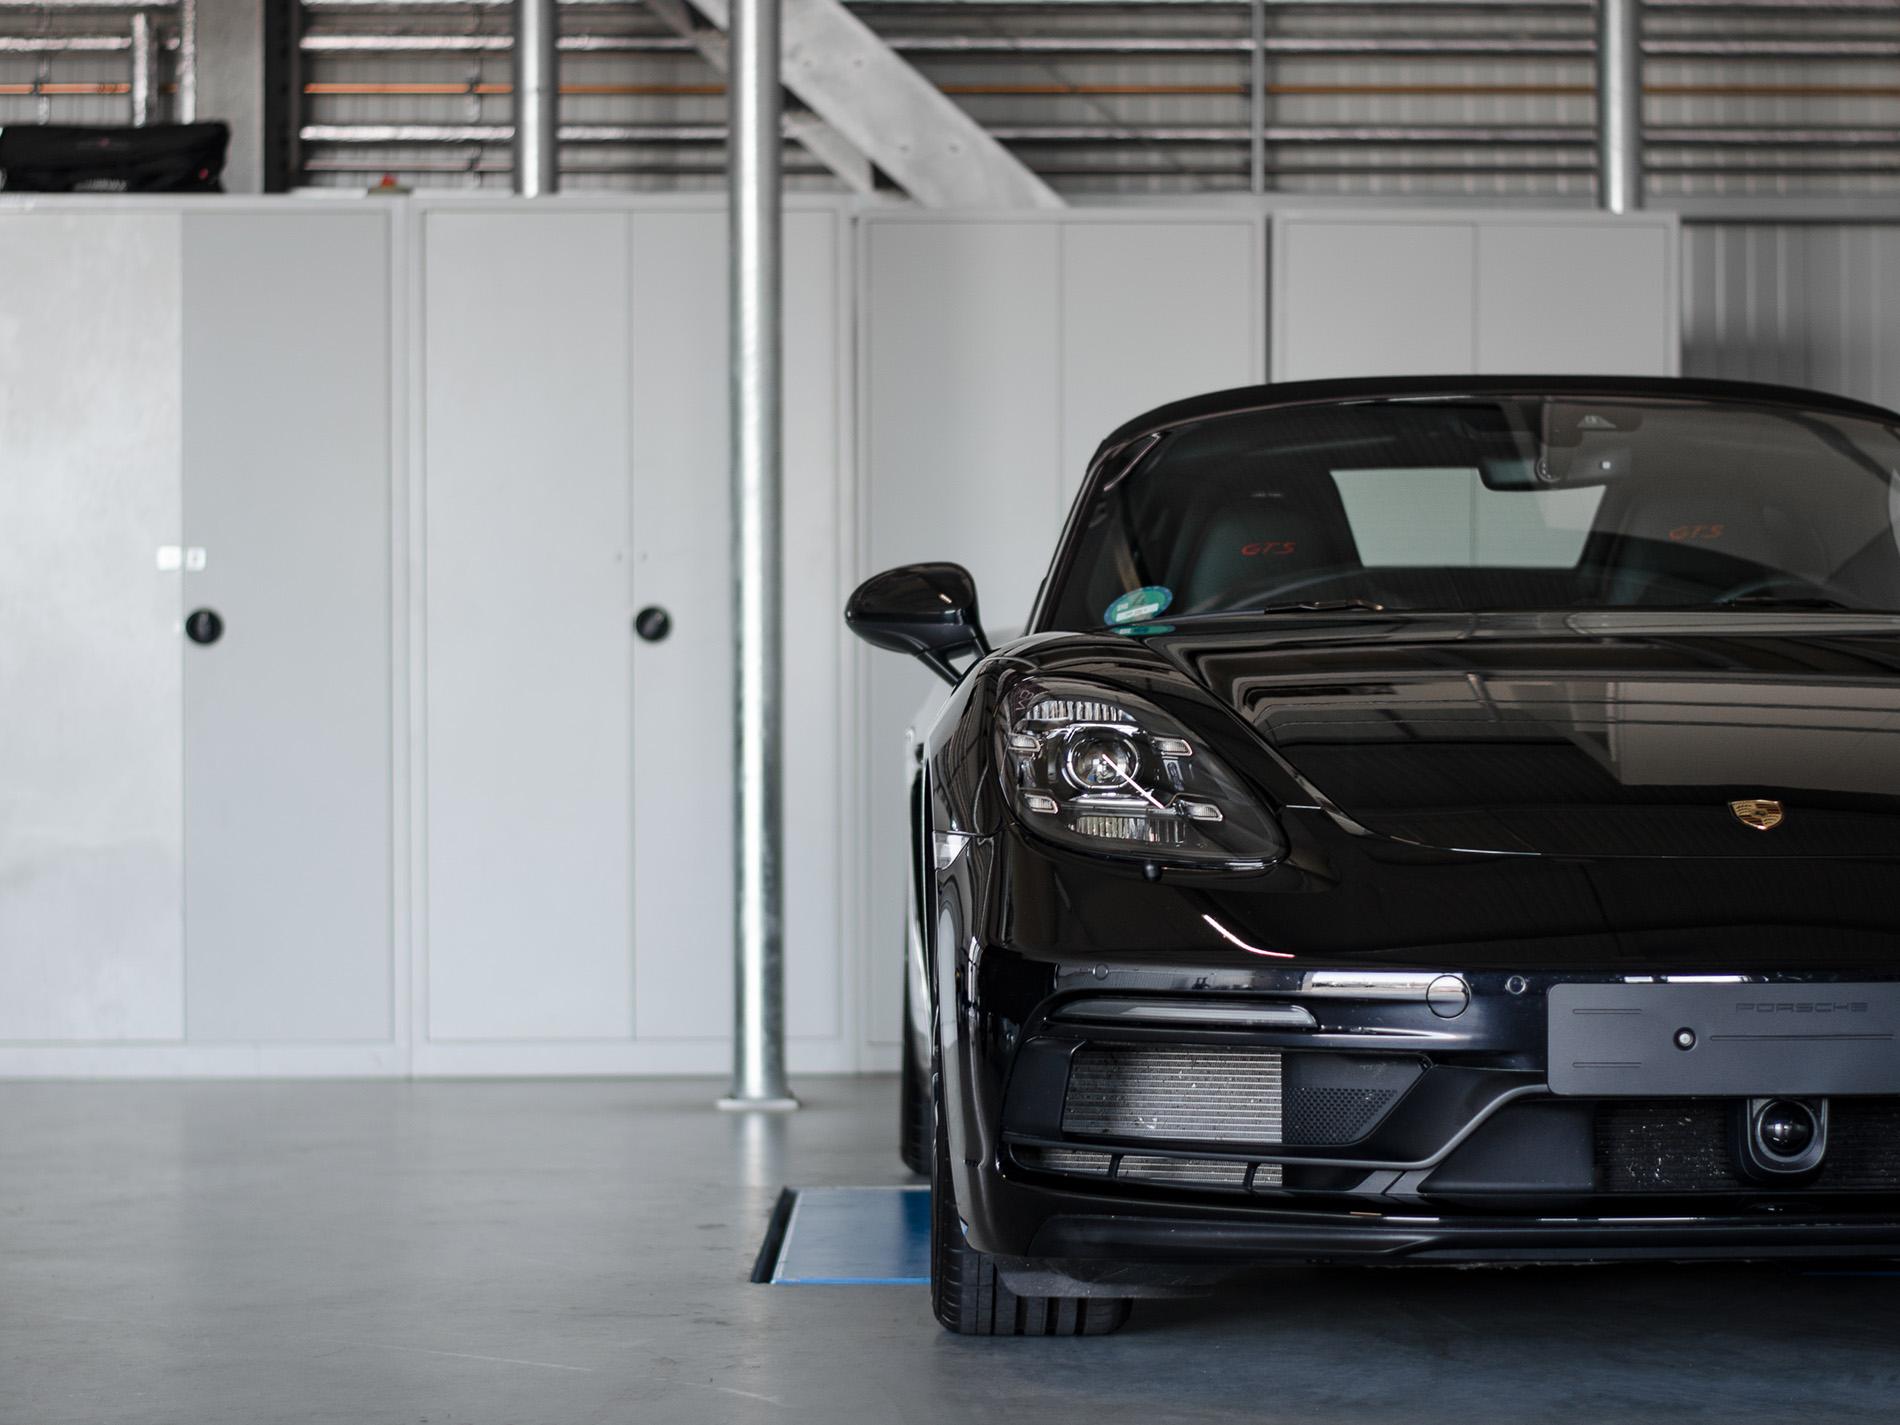 Porsche Boxster GTS Cabrio